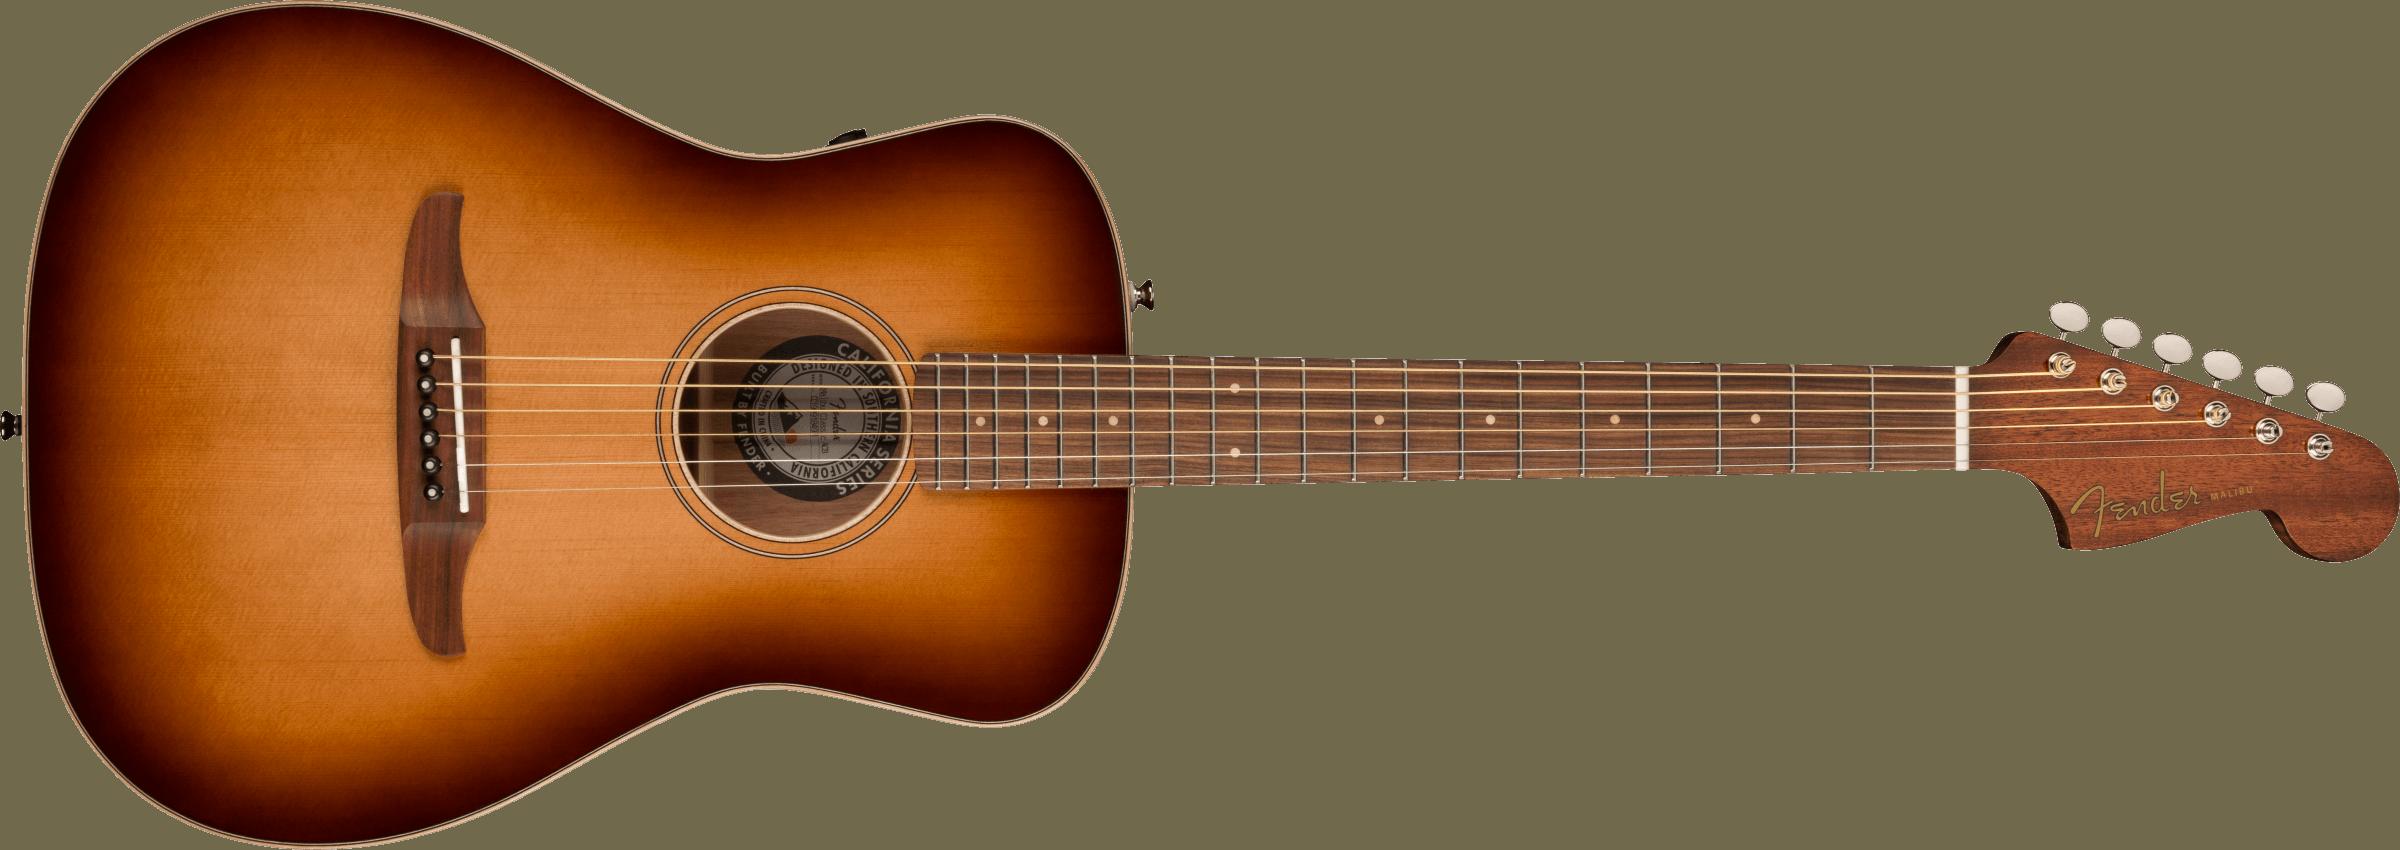 FENDER-Malibu-Classic-Pau-Ferro-Fingerboard-Aged-Cognac-Burst-sku-571004889